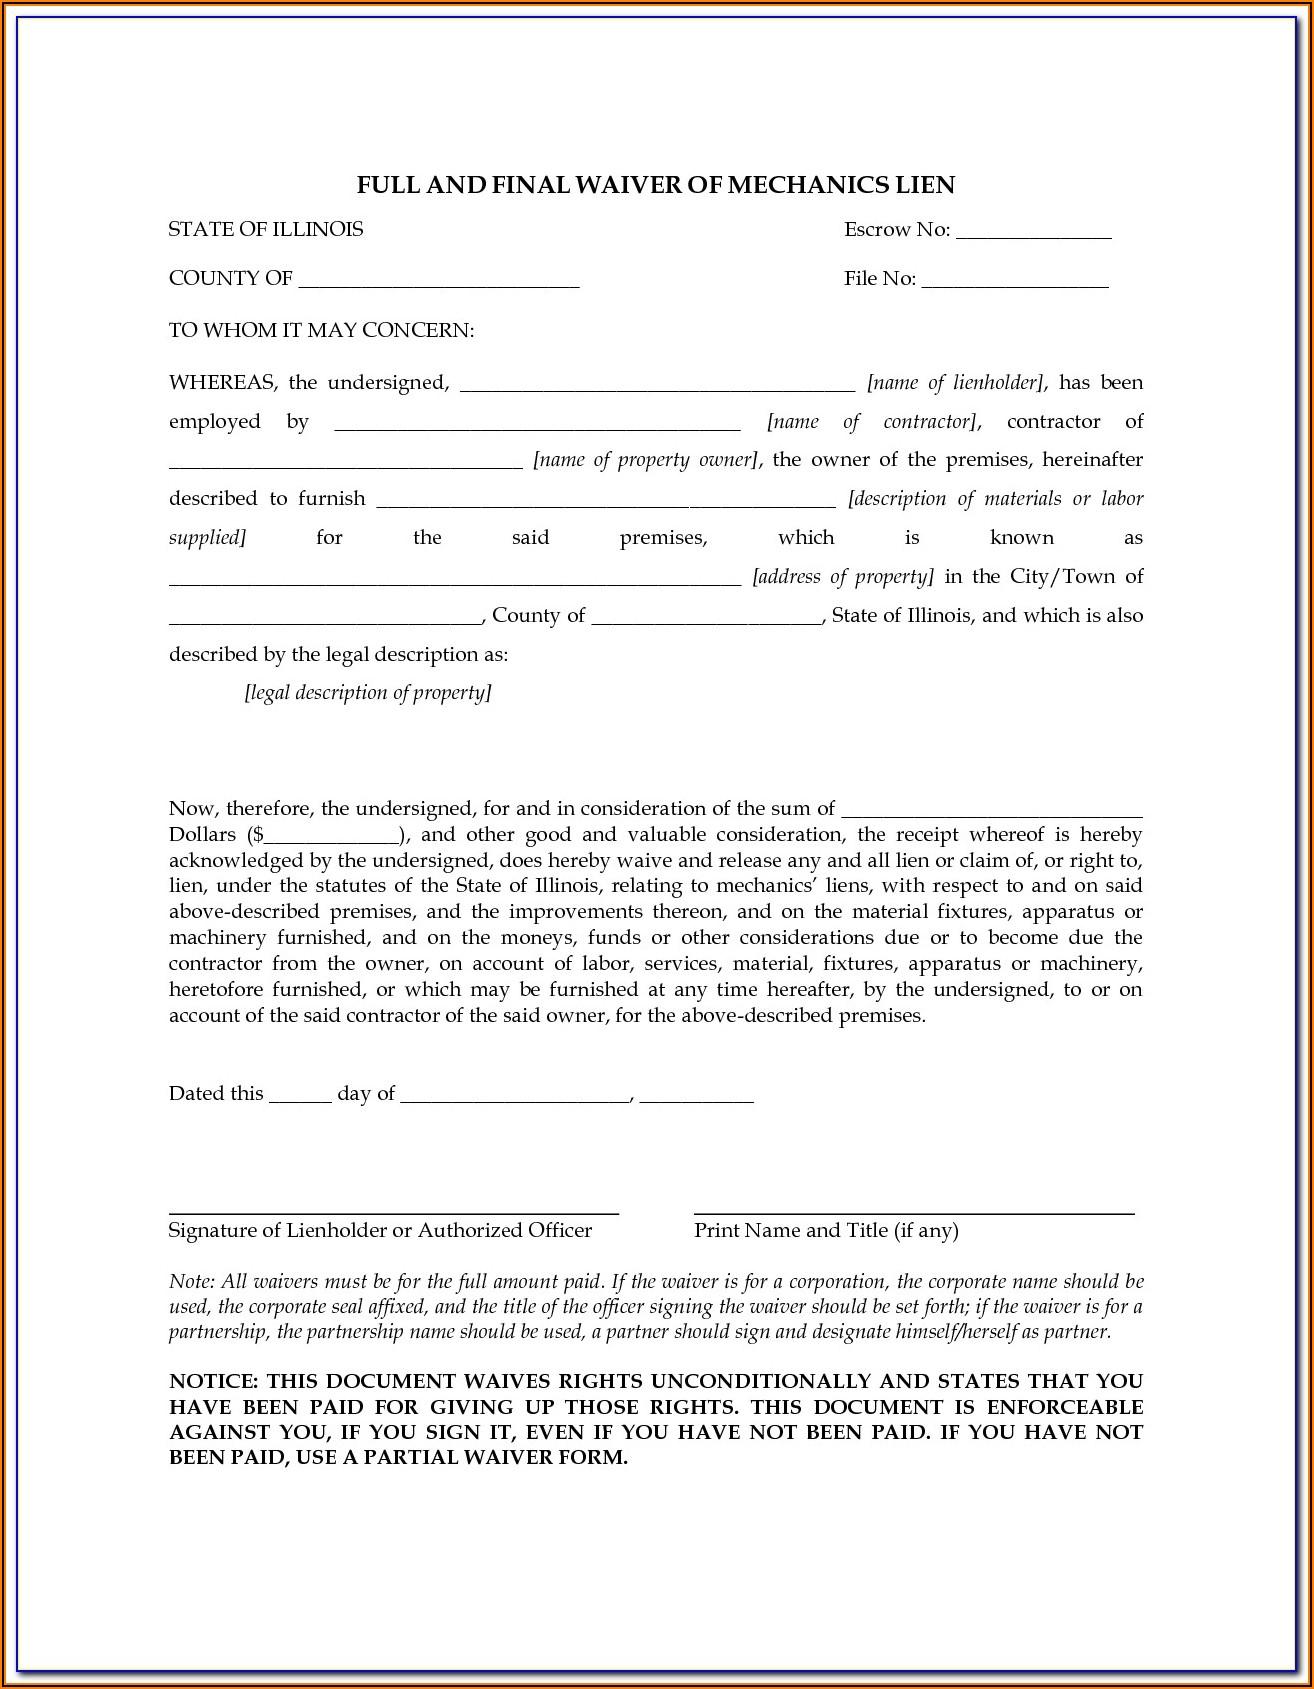 Certificate Of Release Of Federal Tax Lien Form 668(z)